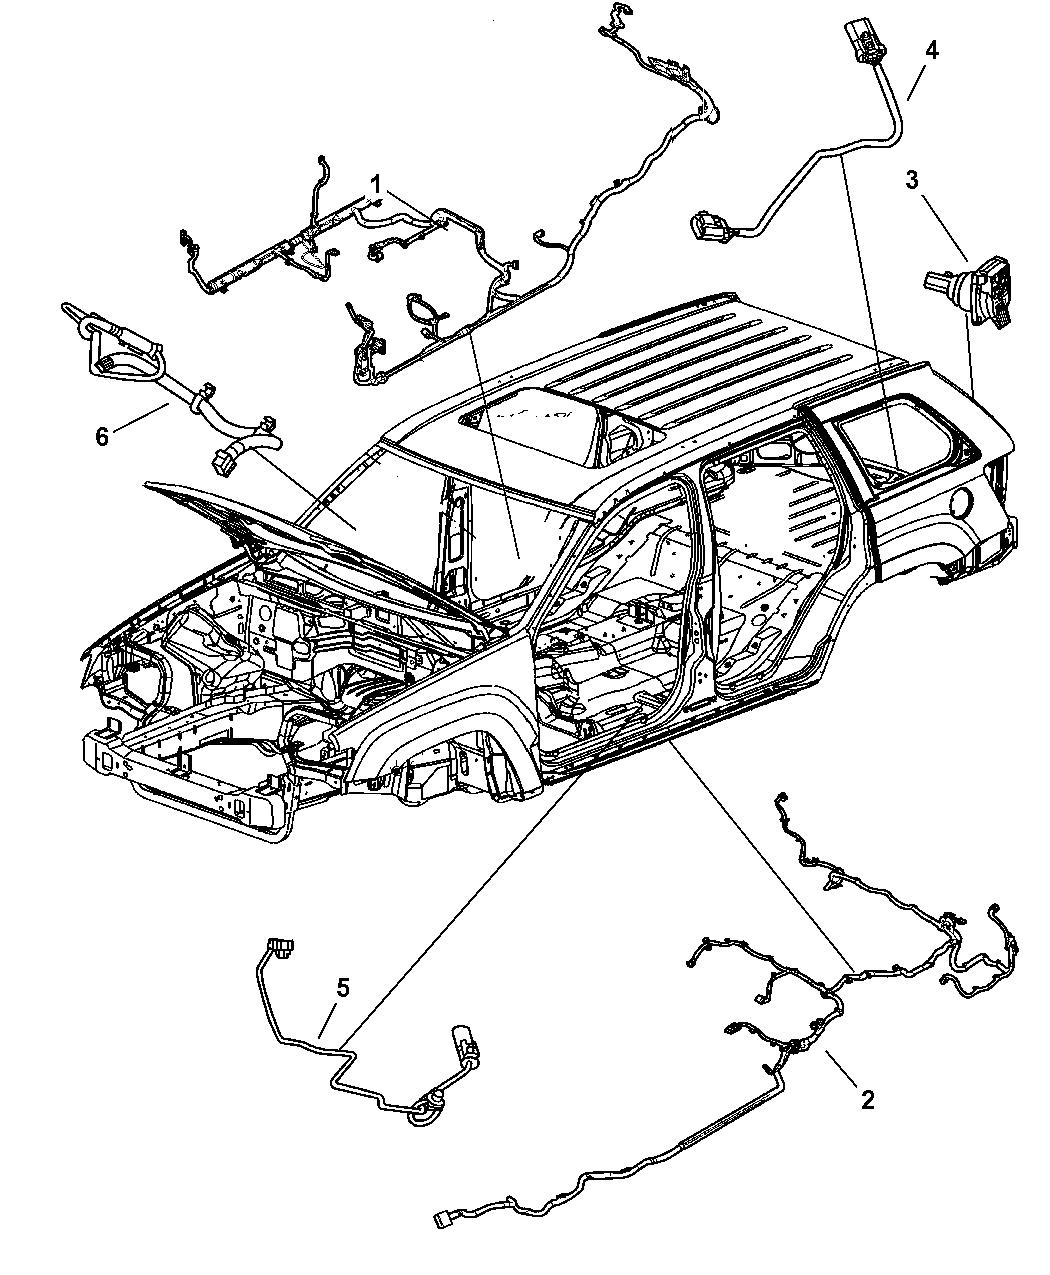 2006 Jeep Grand Cherokee Wiring Body Mopar Parts Giant